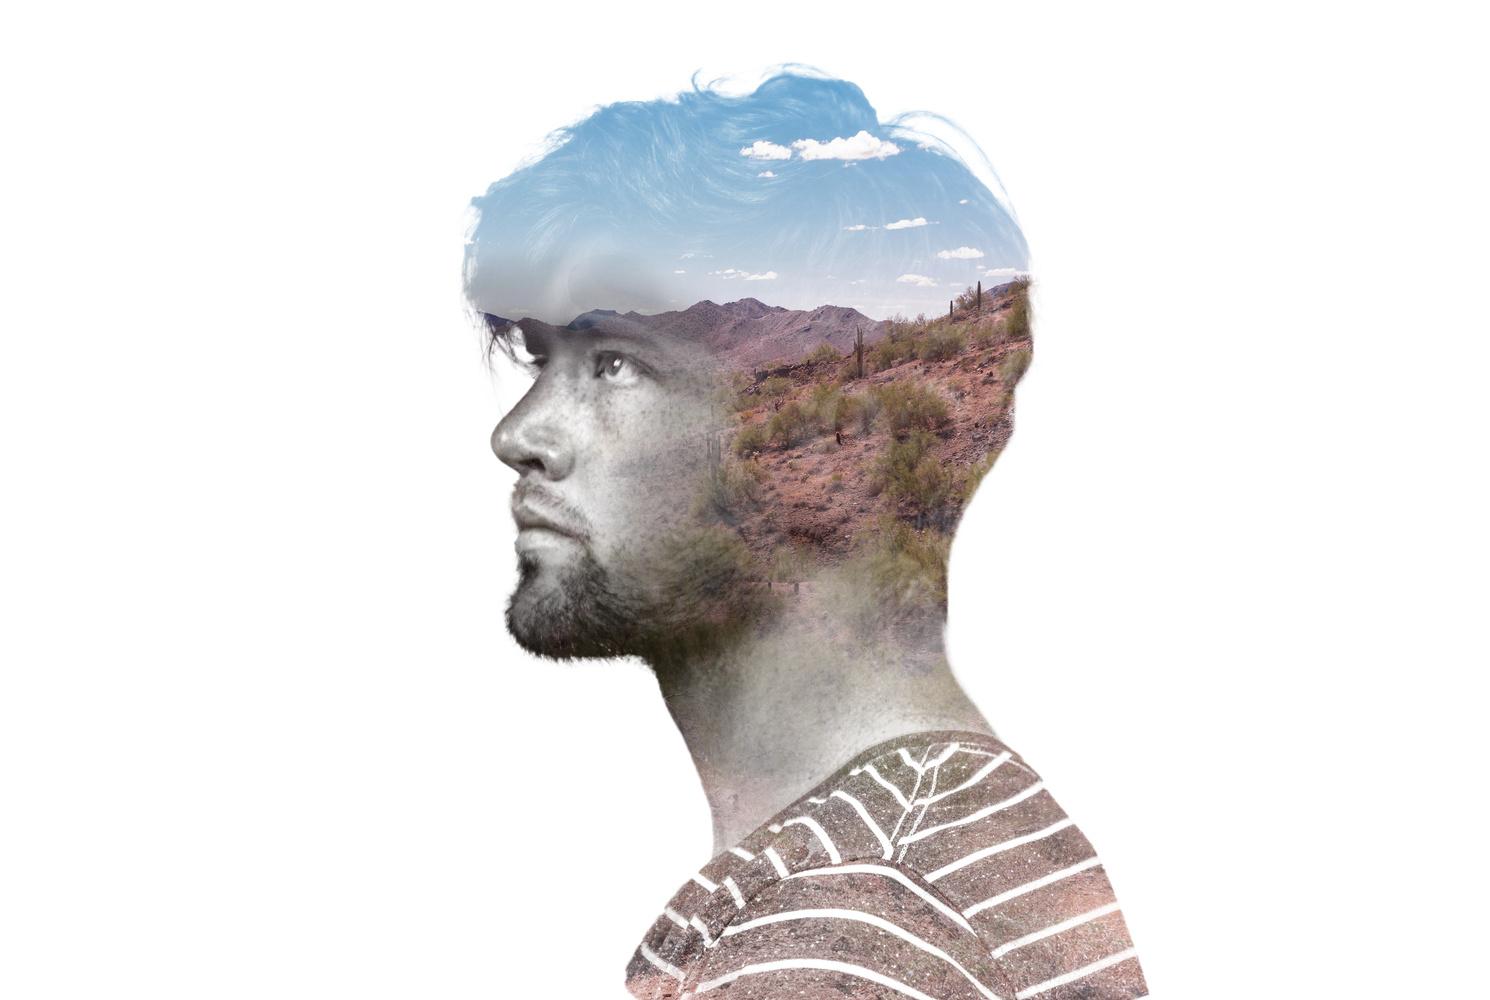 Arizona on My Mind by Jacob VanderHeiden